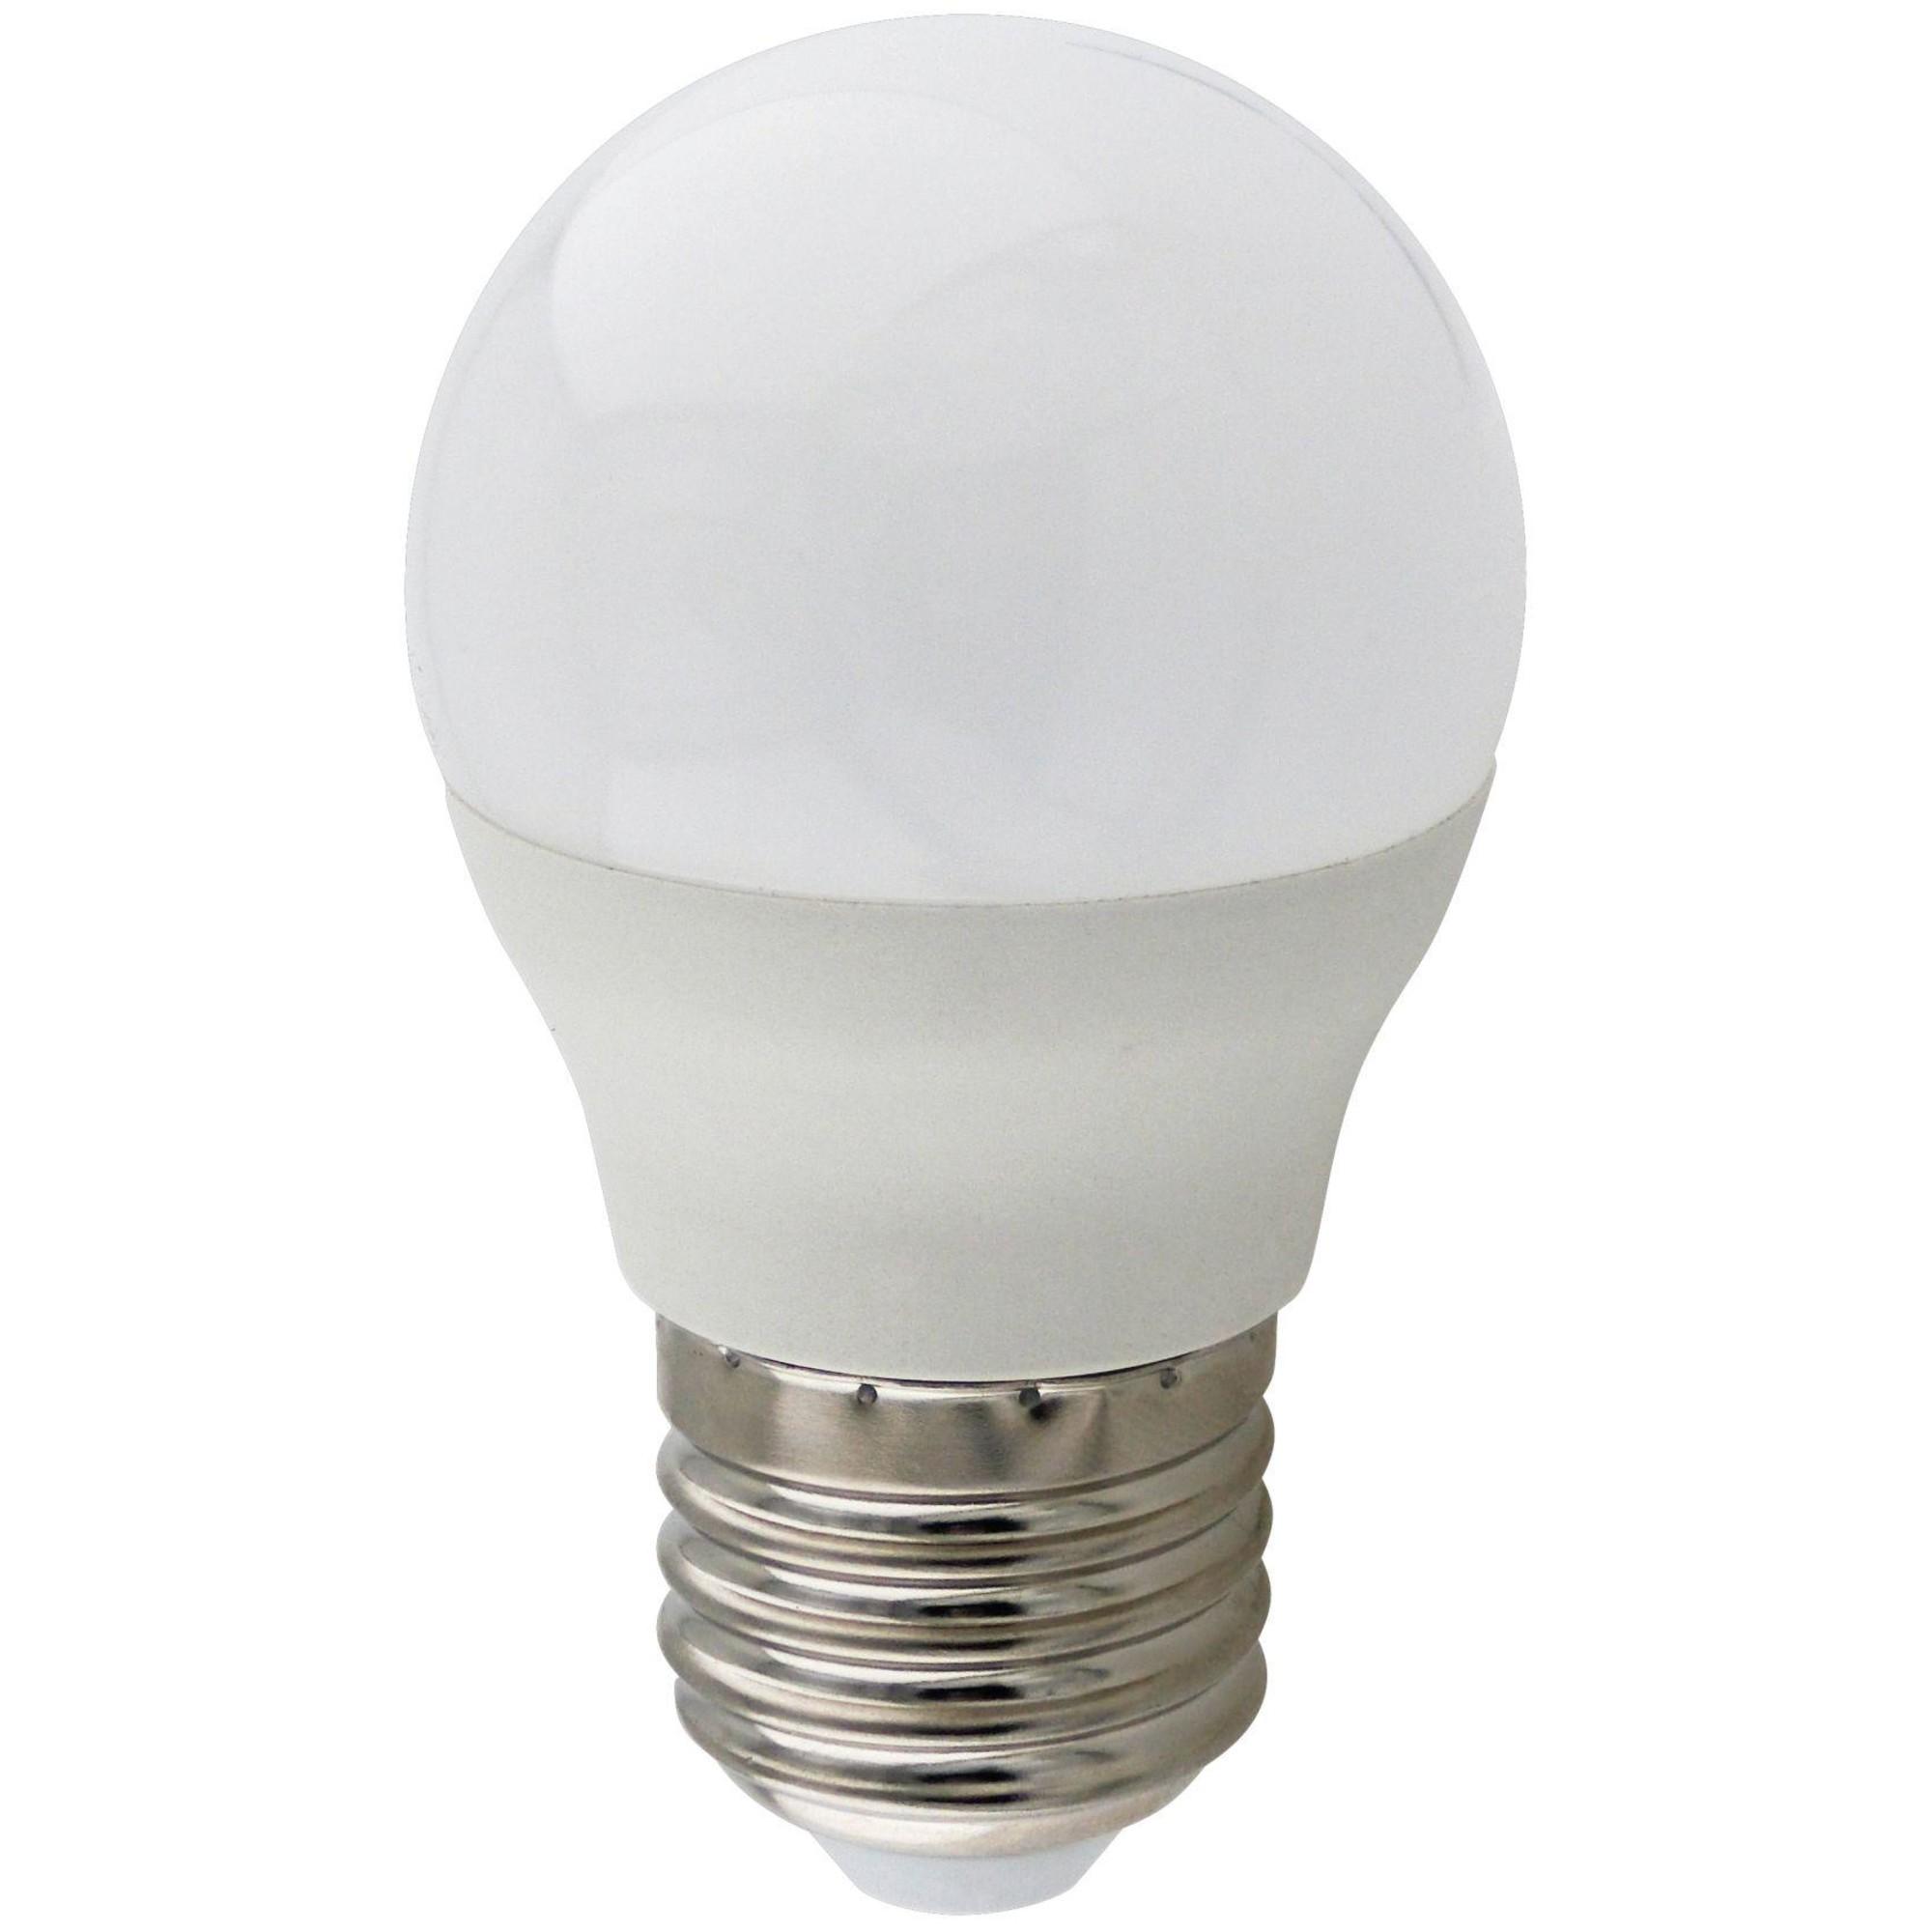 Лампа Ecola Premium светодионая E27 10 Вт шар 800 Лм теплый свет